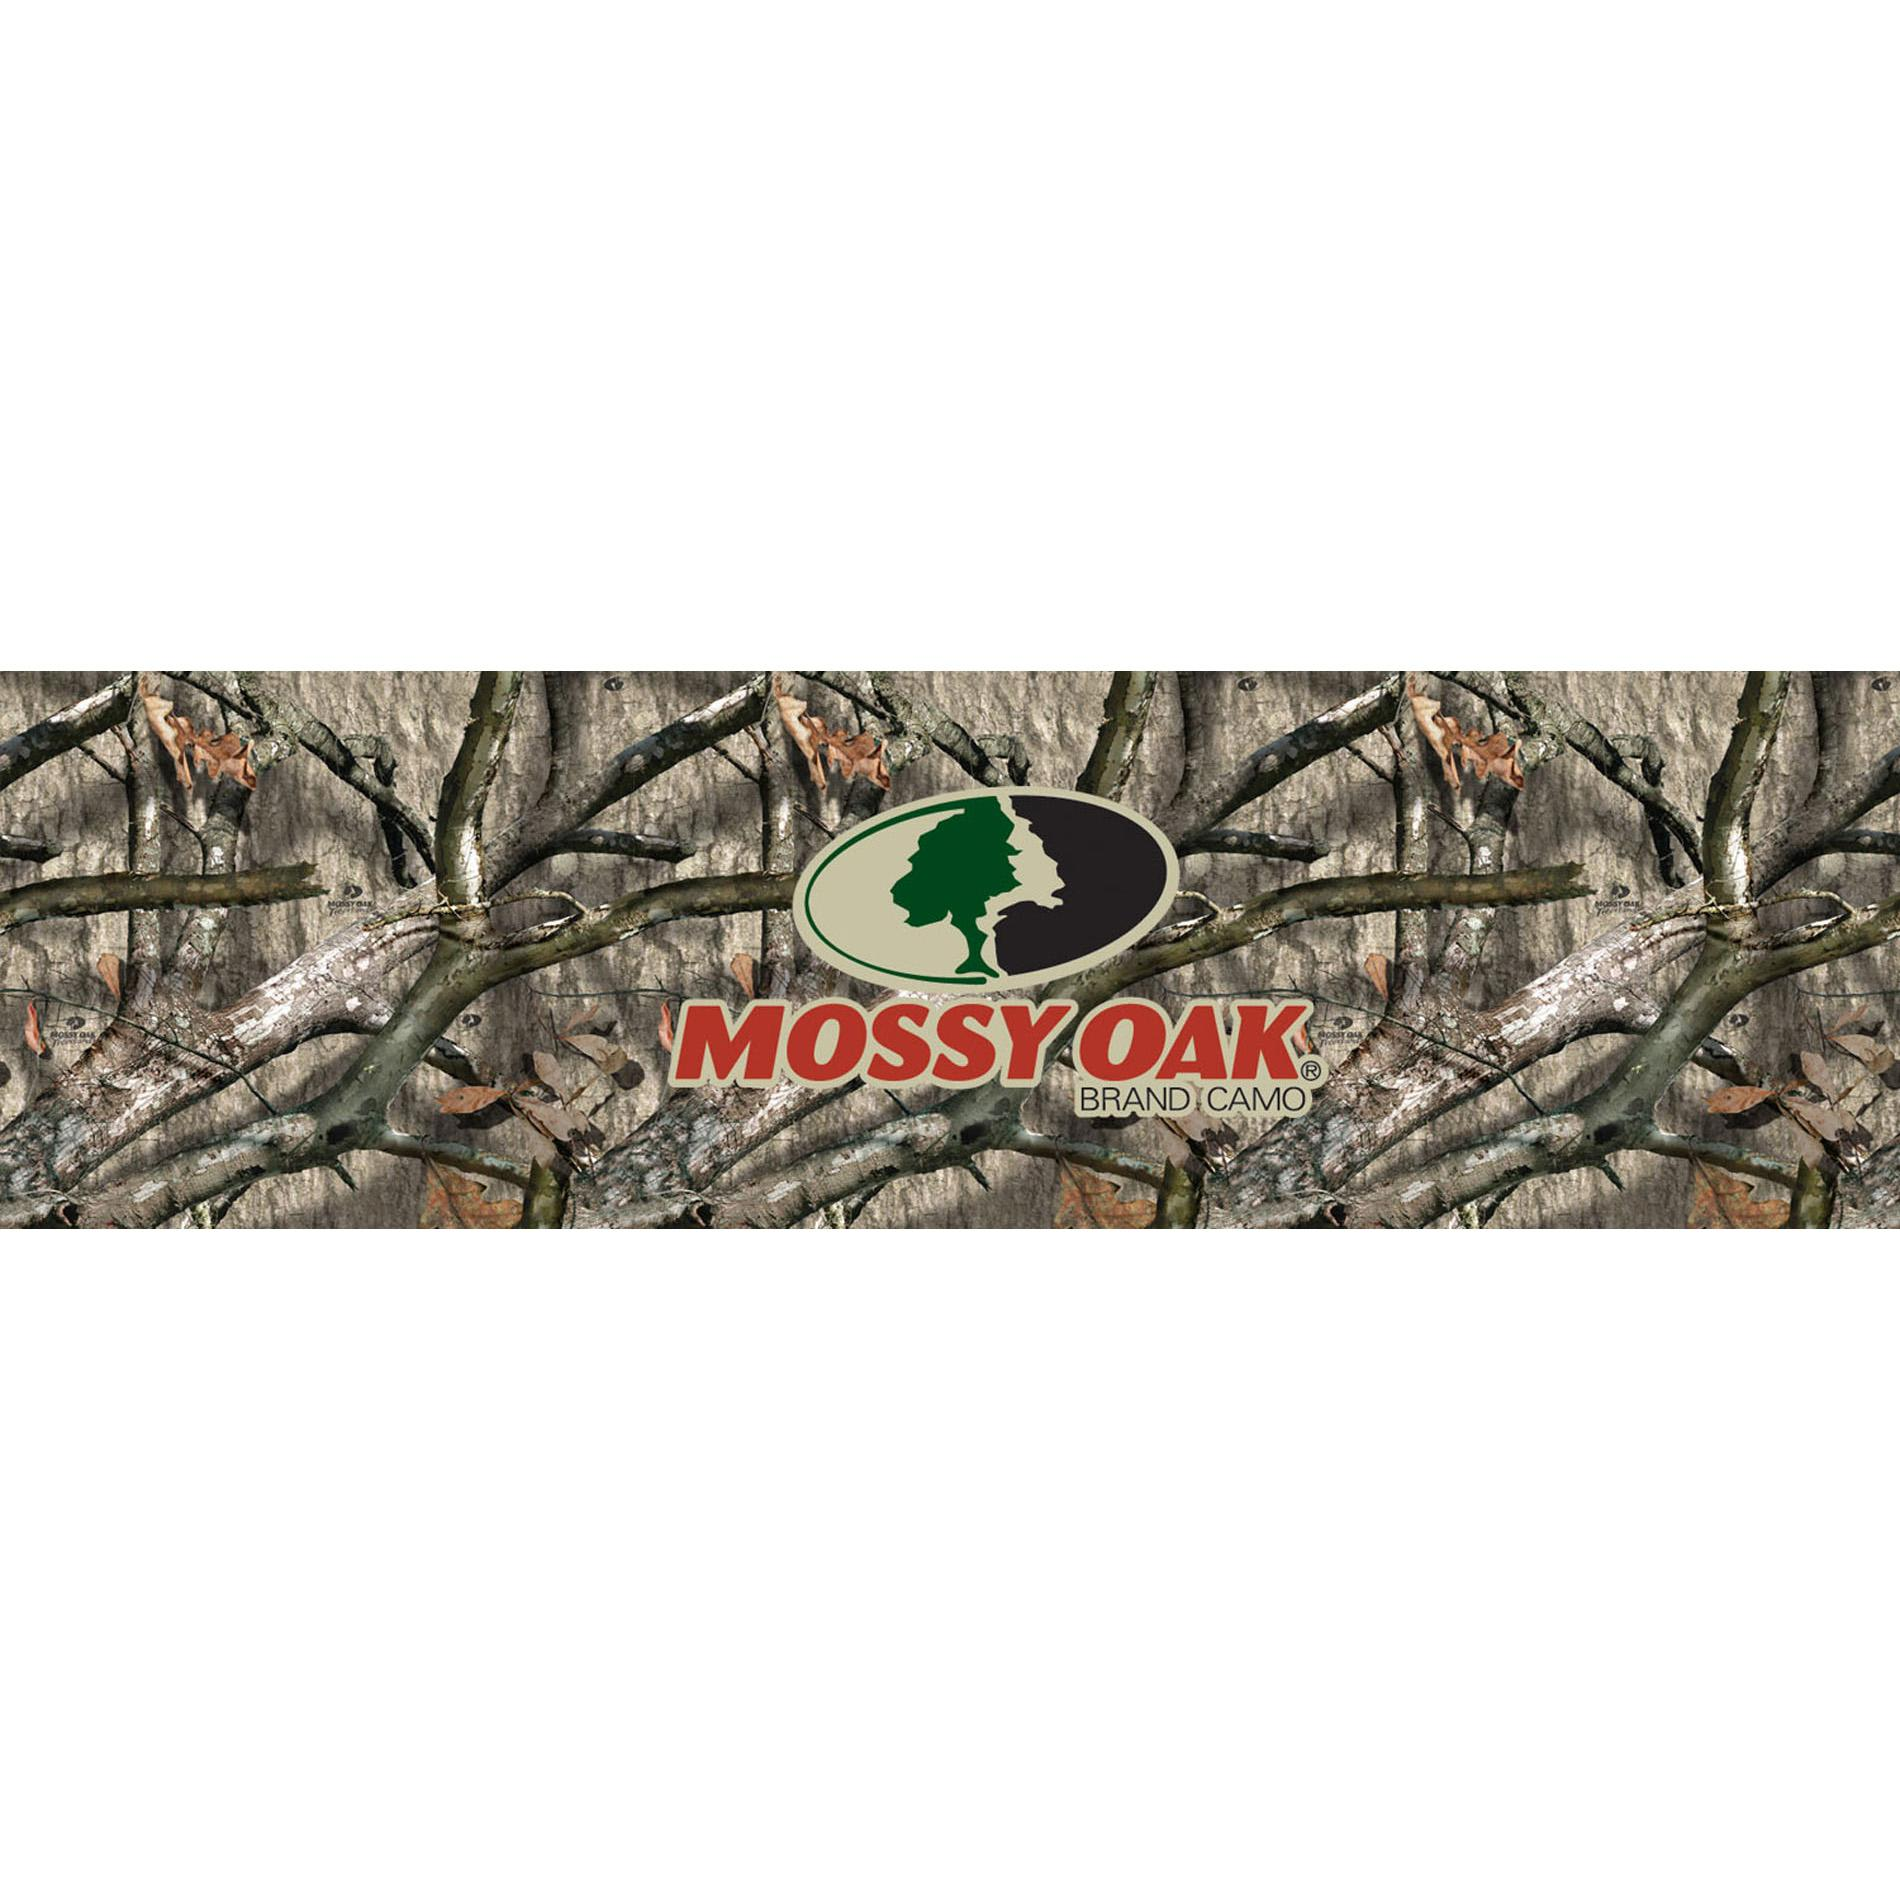 Mossy Oak Infinity Camo Full Size Tailgate Logo Graphic - Thumbnail 1